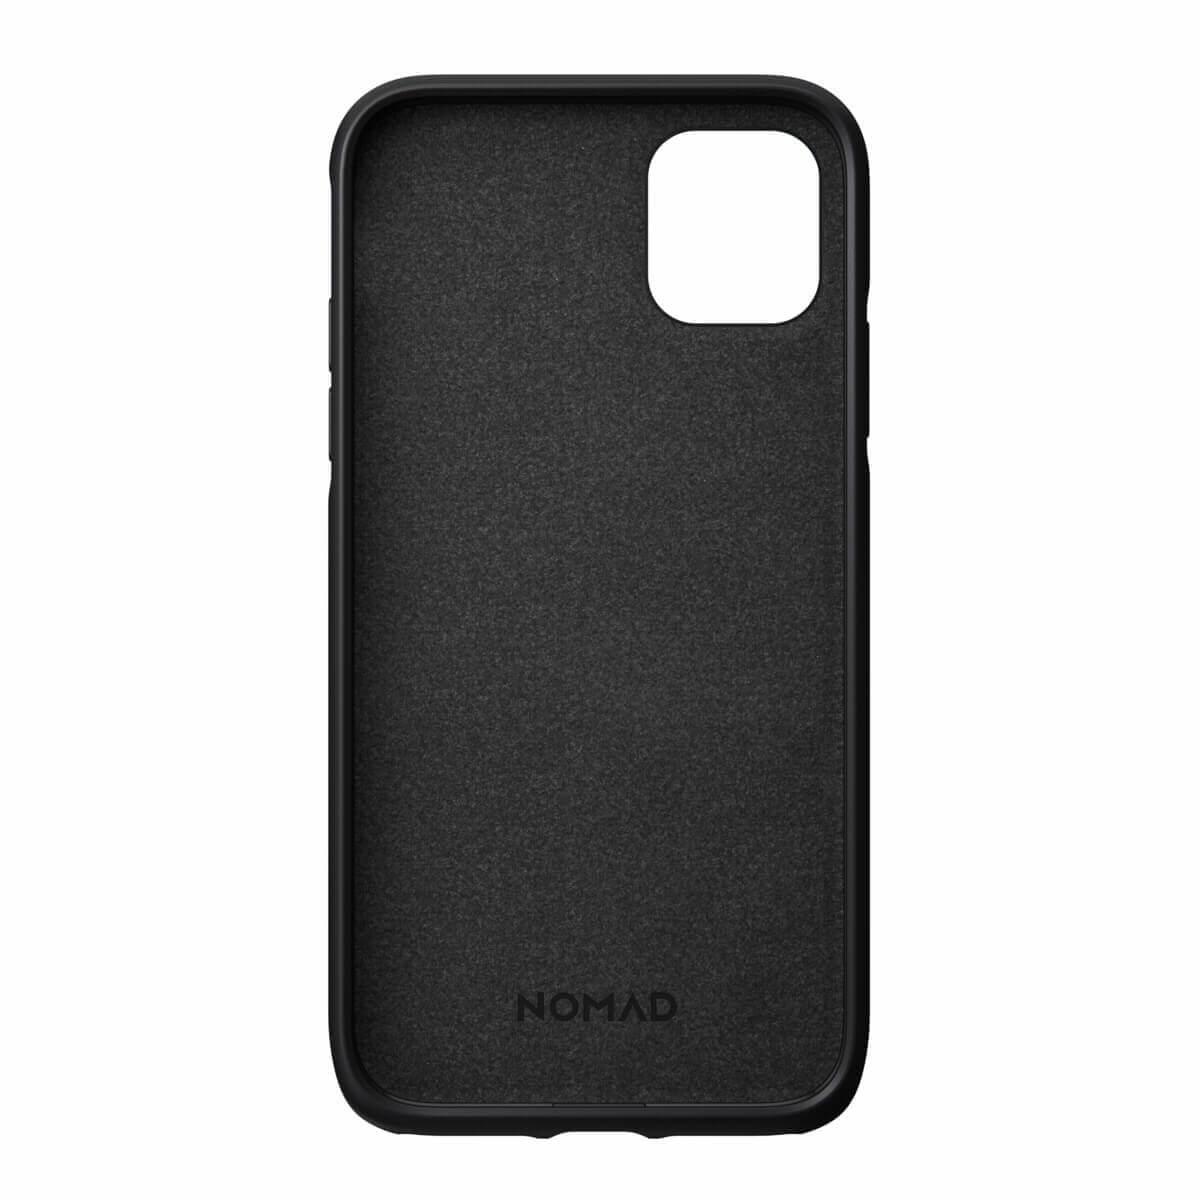 Nomad Leather Rugged Waterproof Case — кожен (естествена кожа) кейс за iPhone 11 (кафяв) - 4